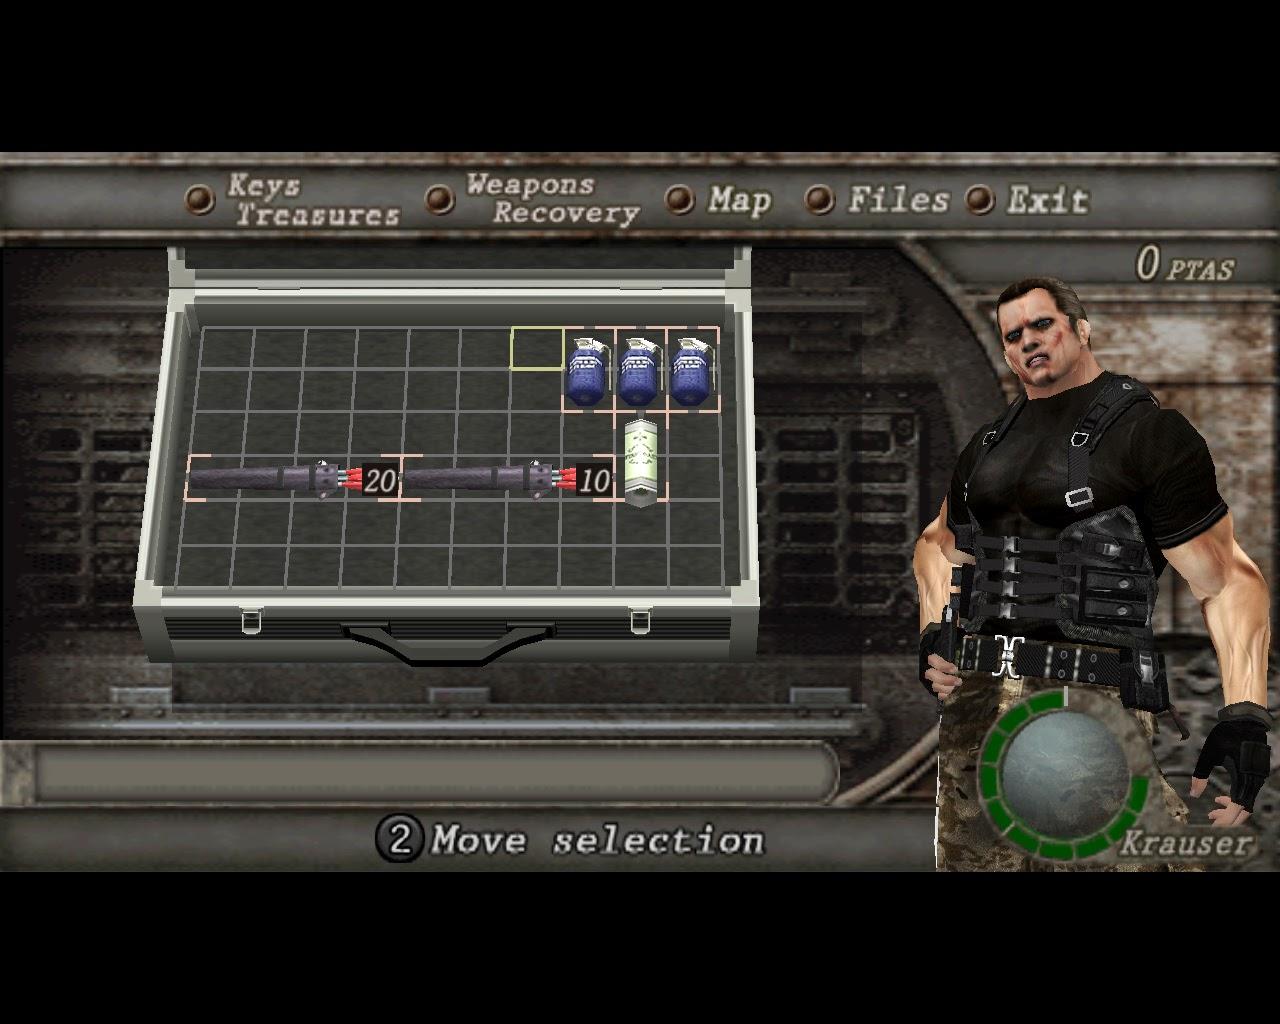 [OFFLINE] Krauser Mega HD Game%2B2015-03-08%2B17-16-08-859